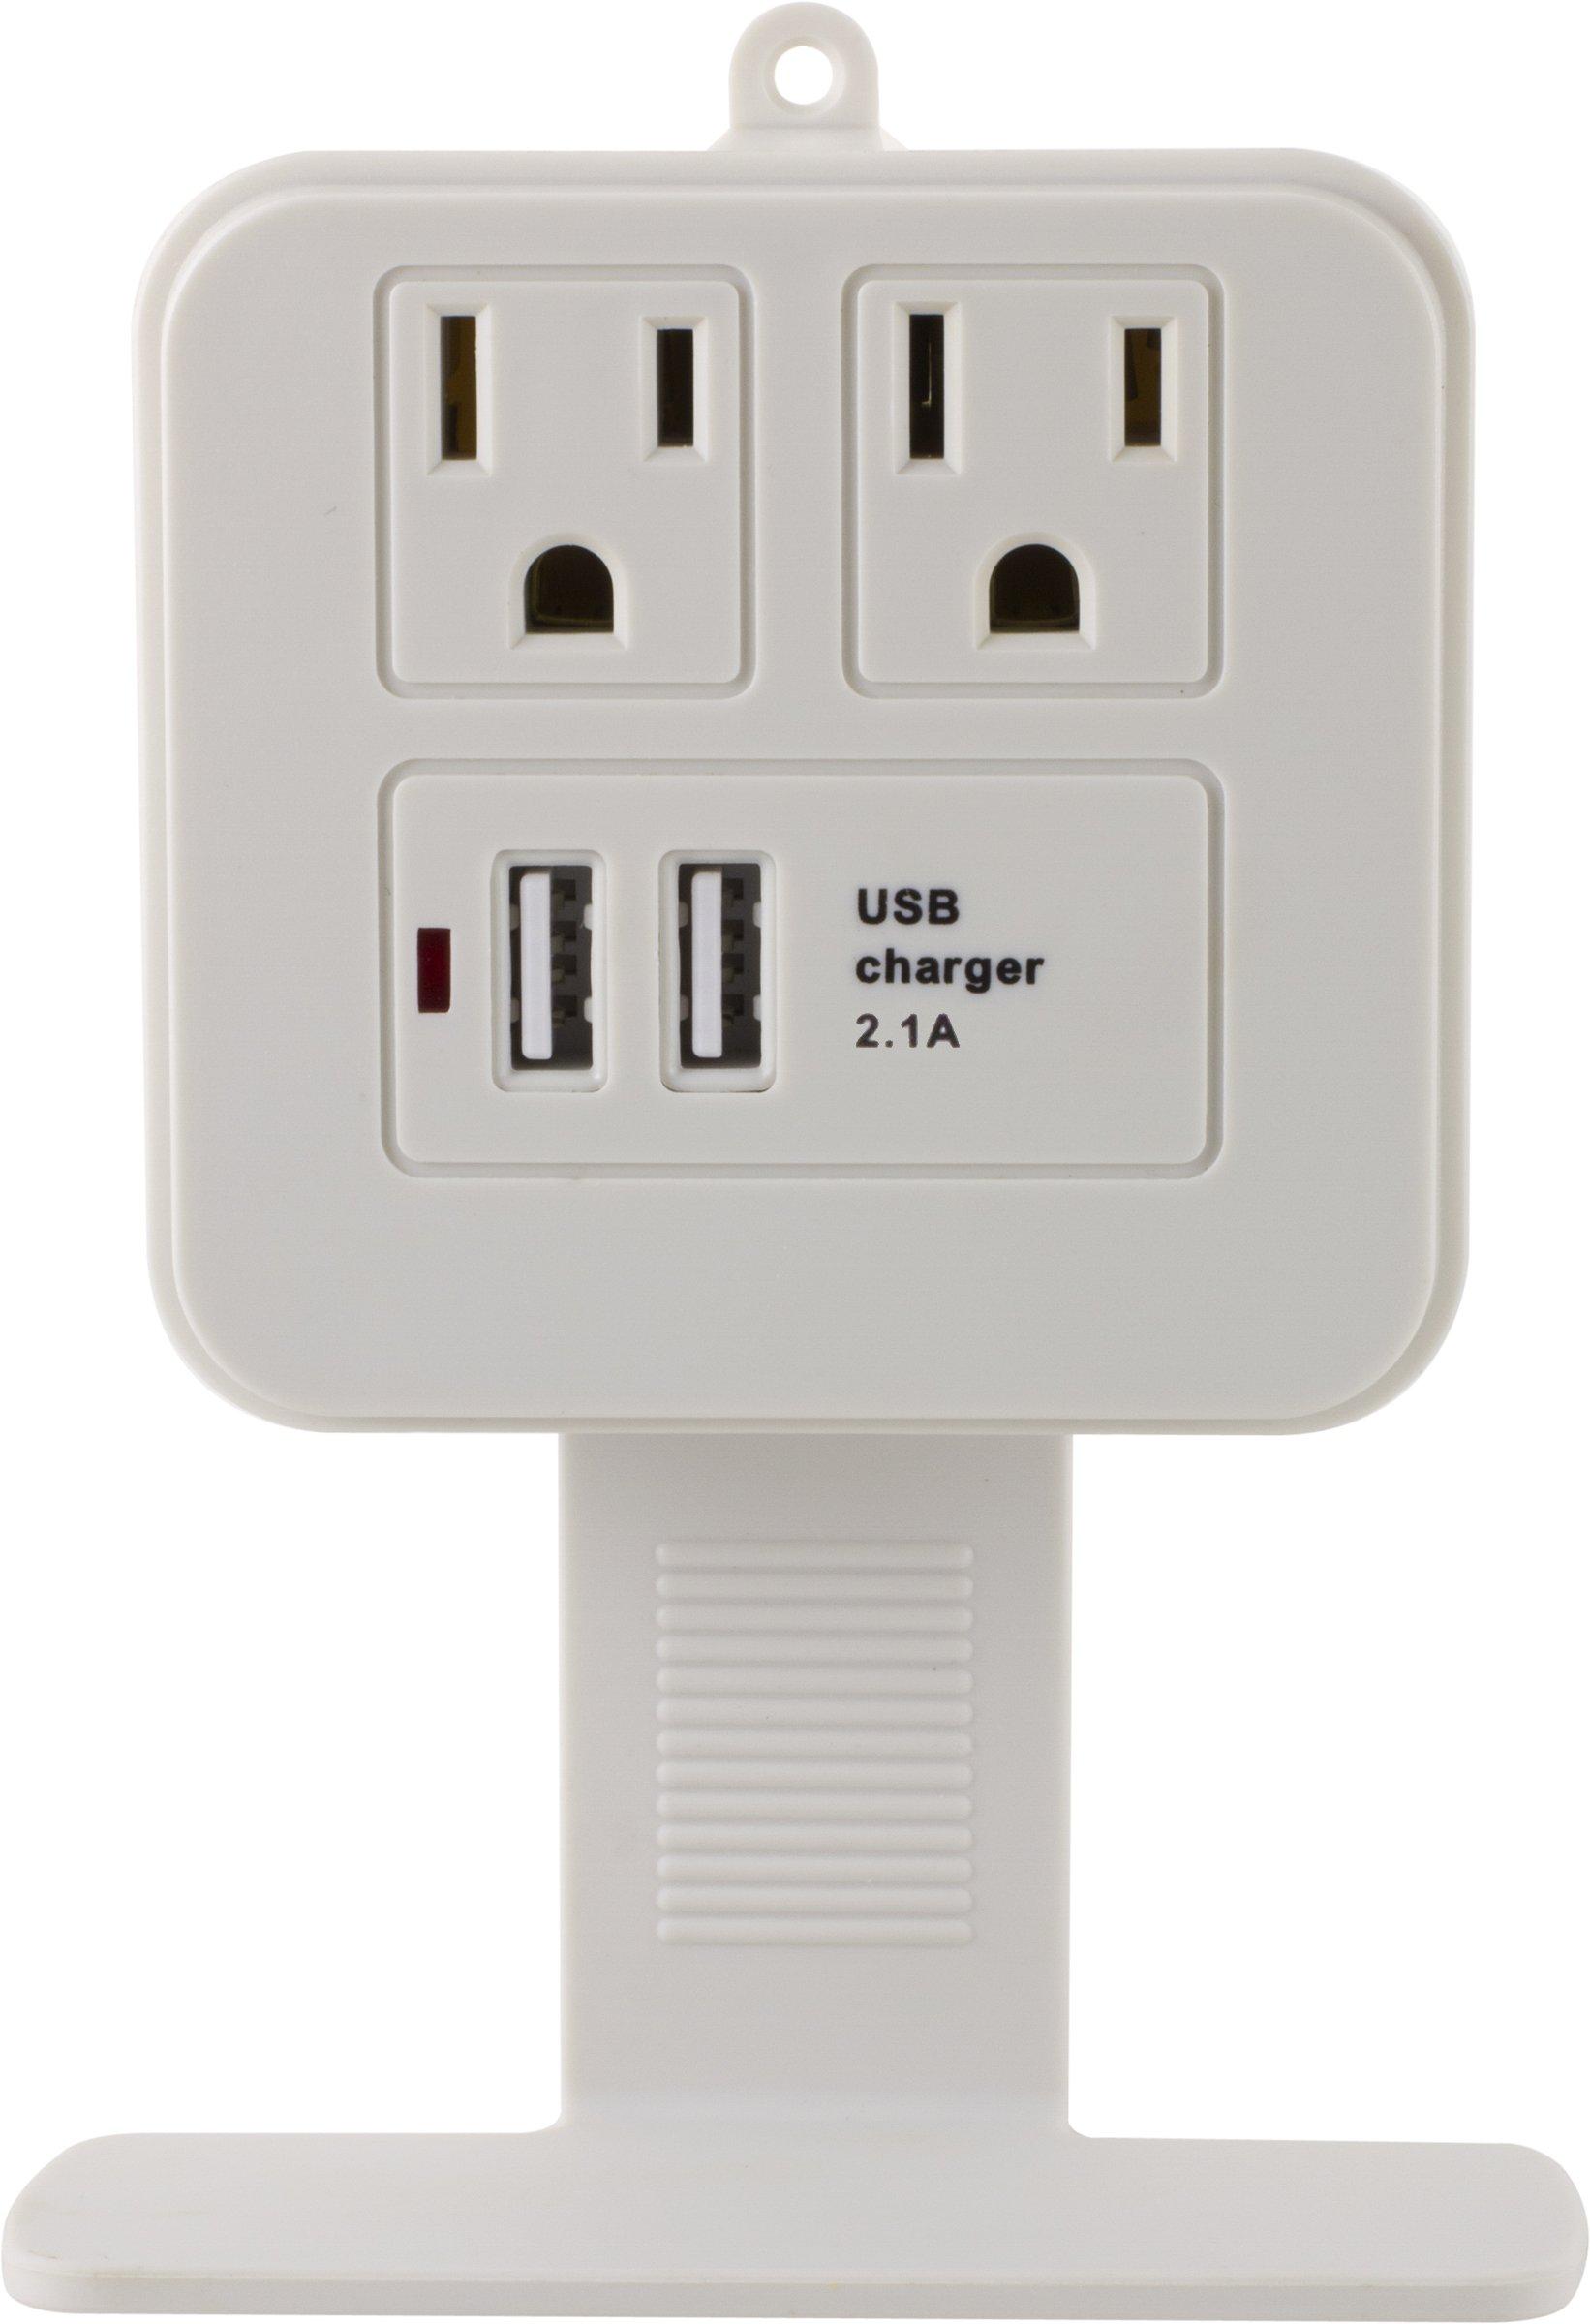 GE 14627 Surge Tap, 2 Outlets, 245J, USB, 2 Ports, 2.1A, Shelf, White, French/English